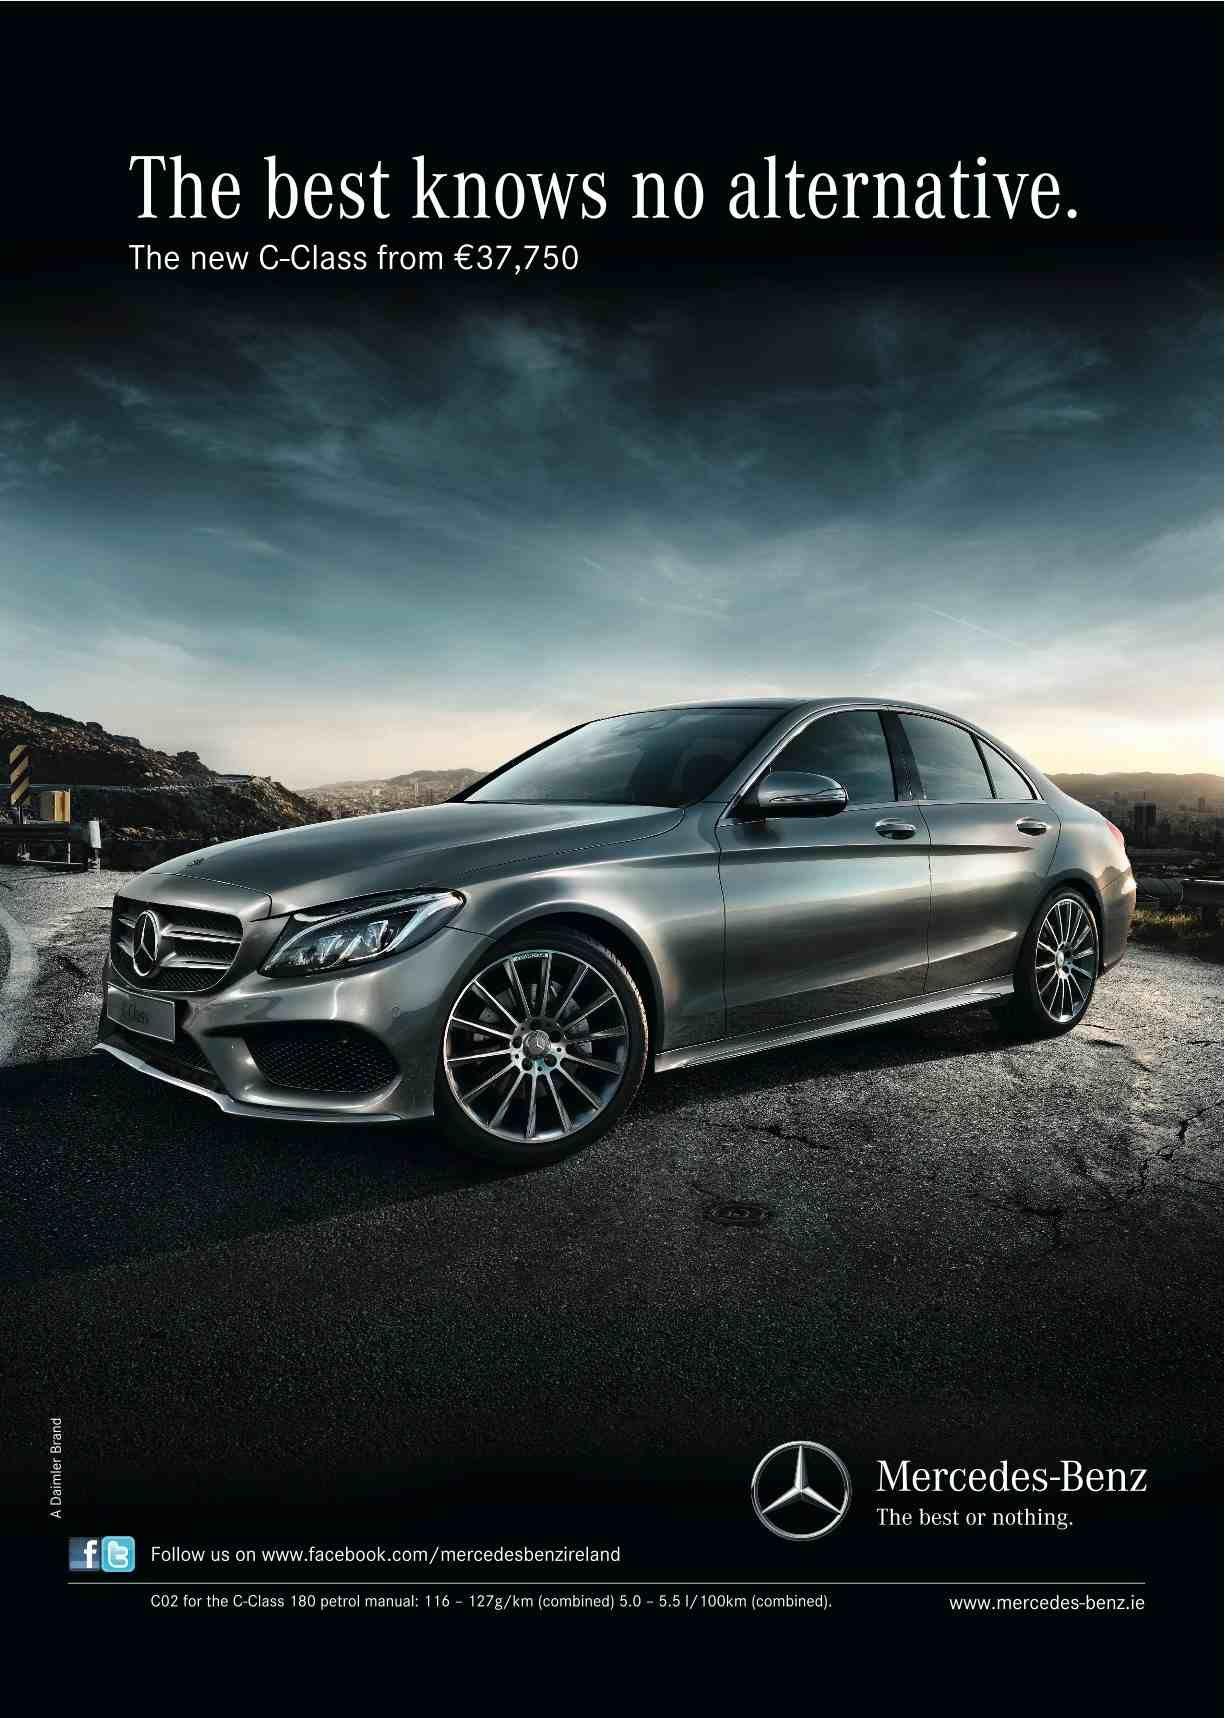 Magazine Car Advertisements 2014 Car advertising, Car